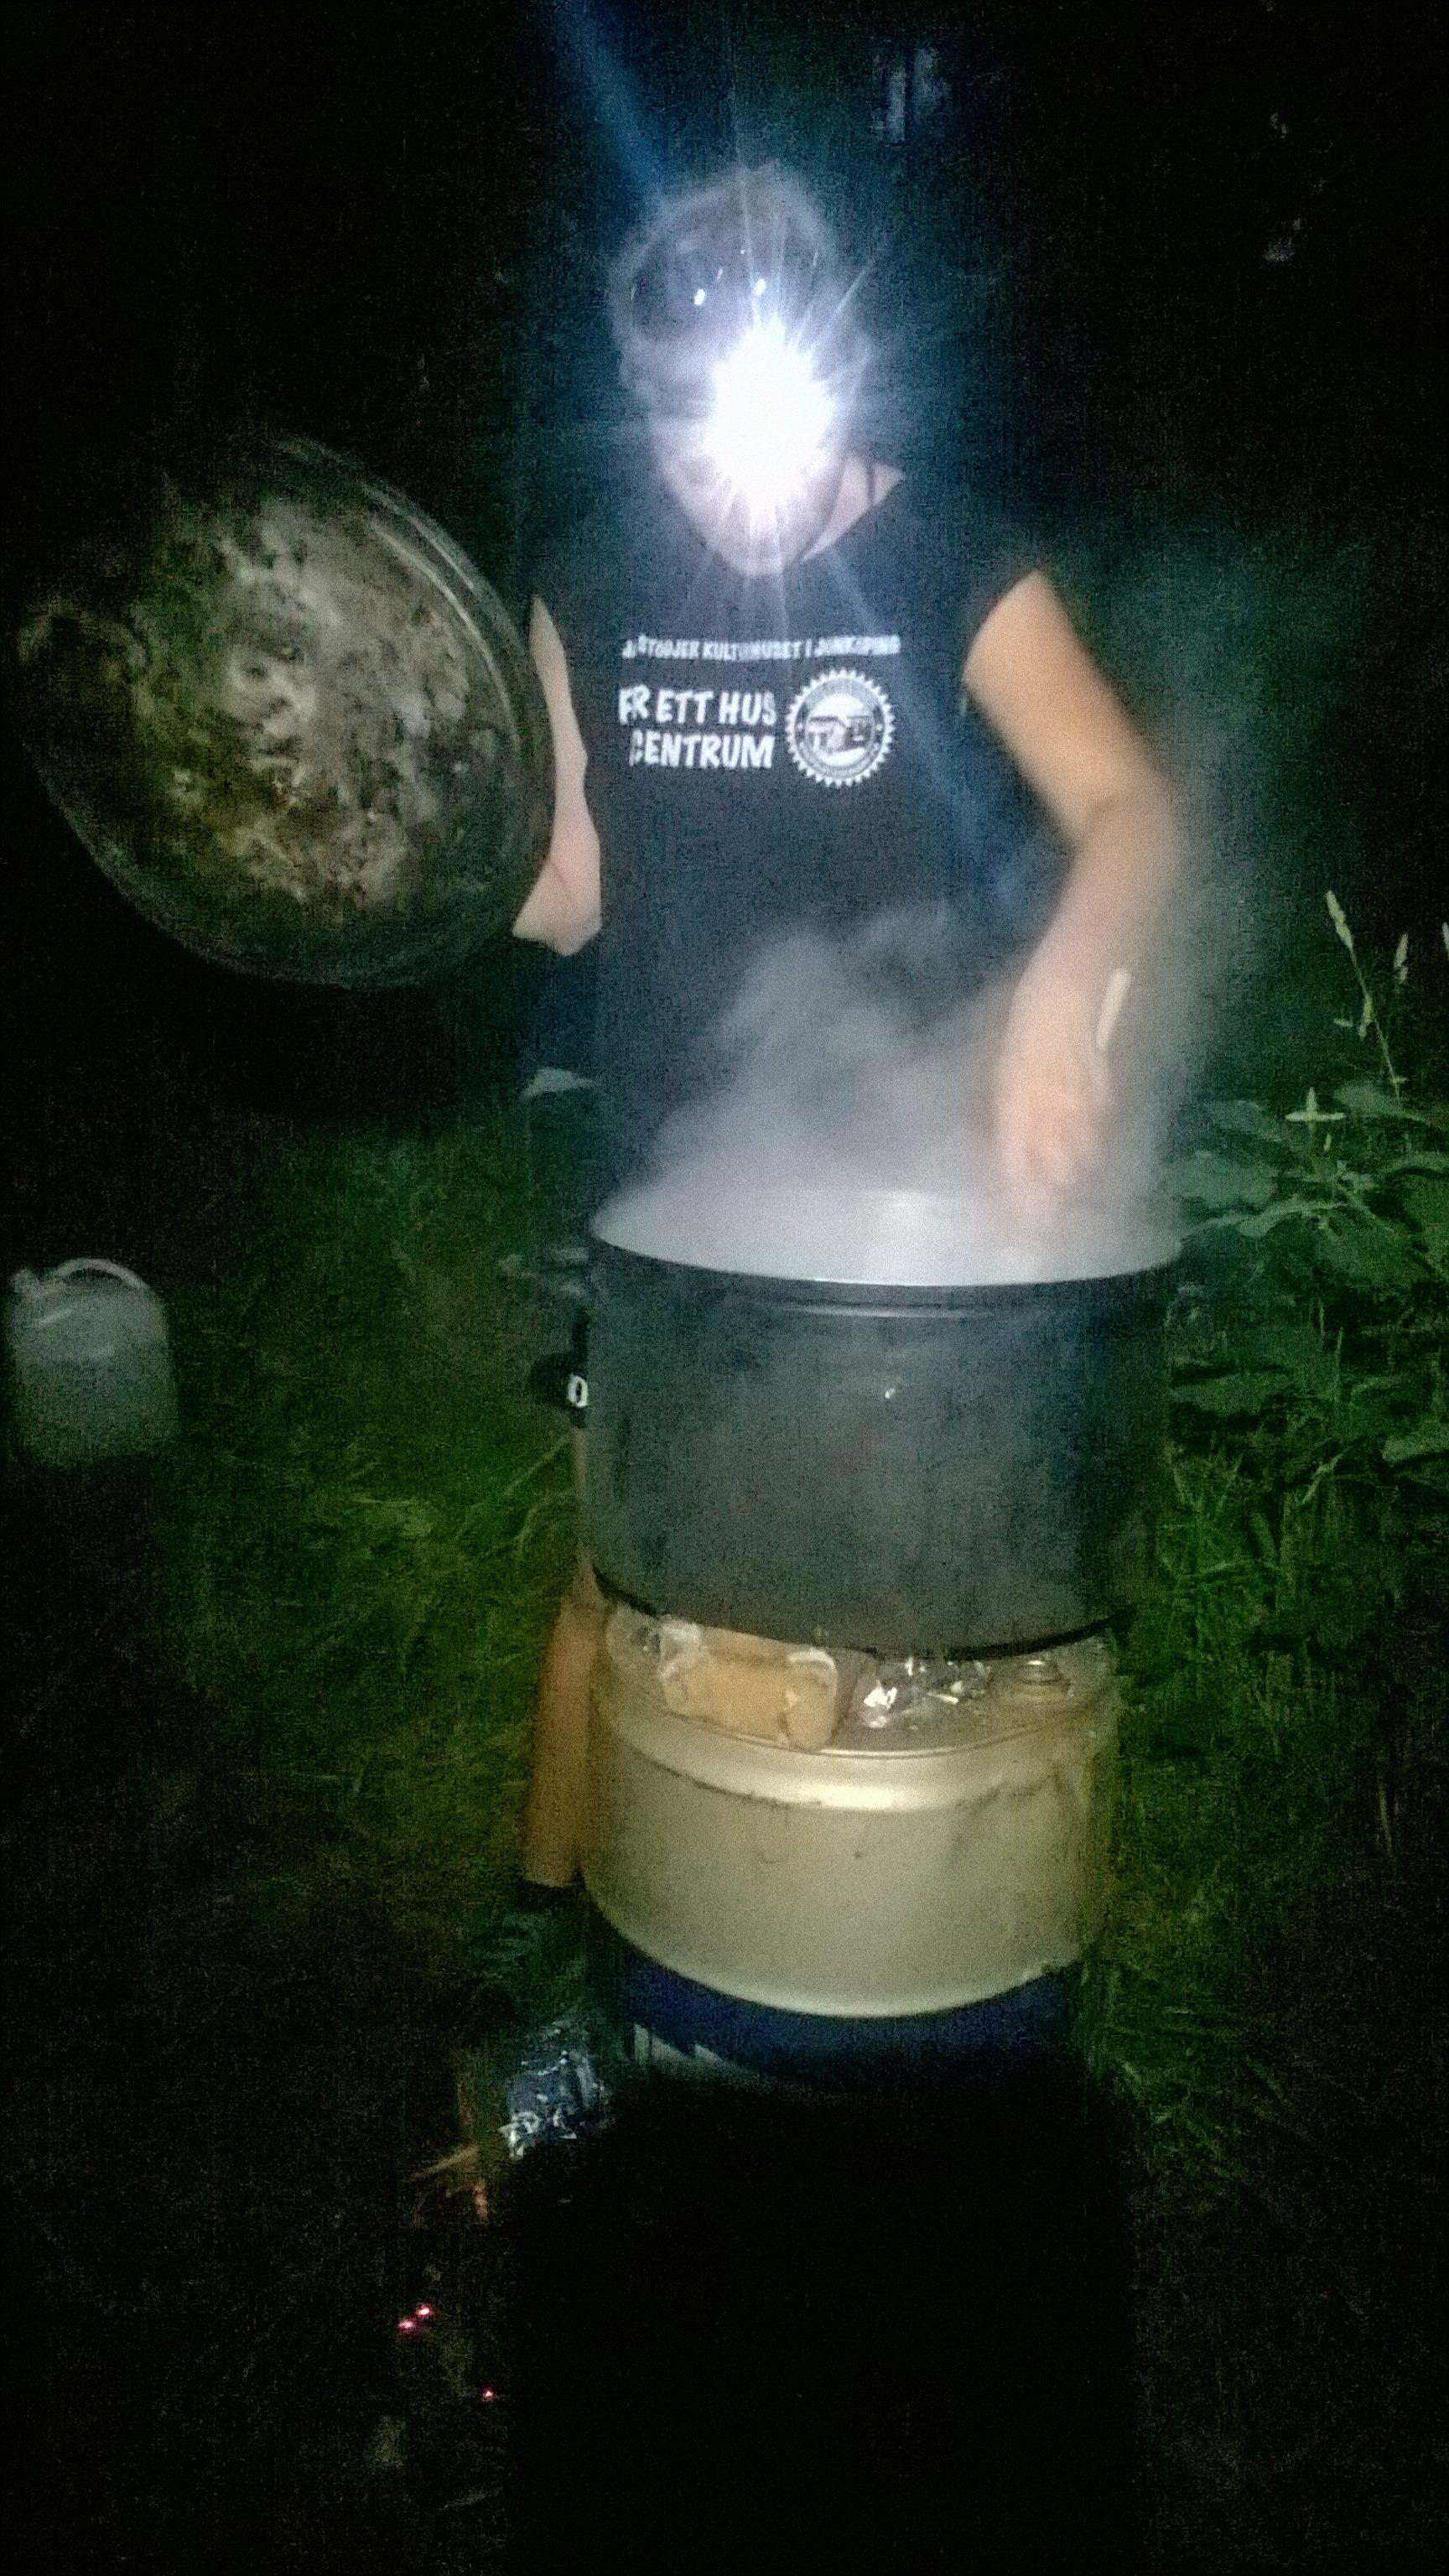 The rocket stove at work